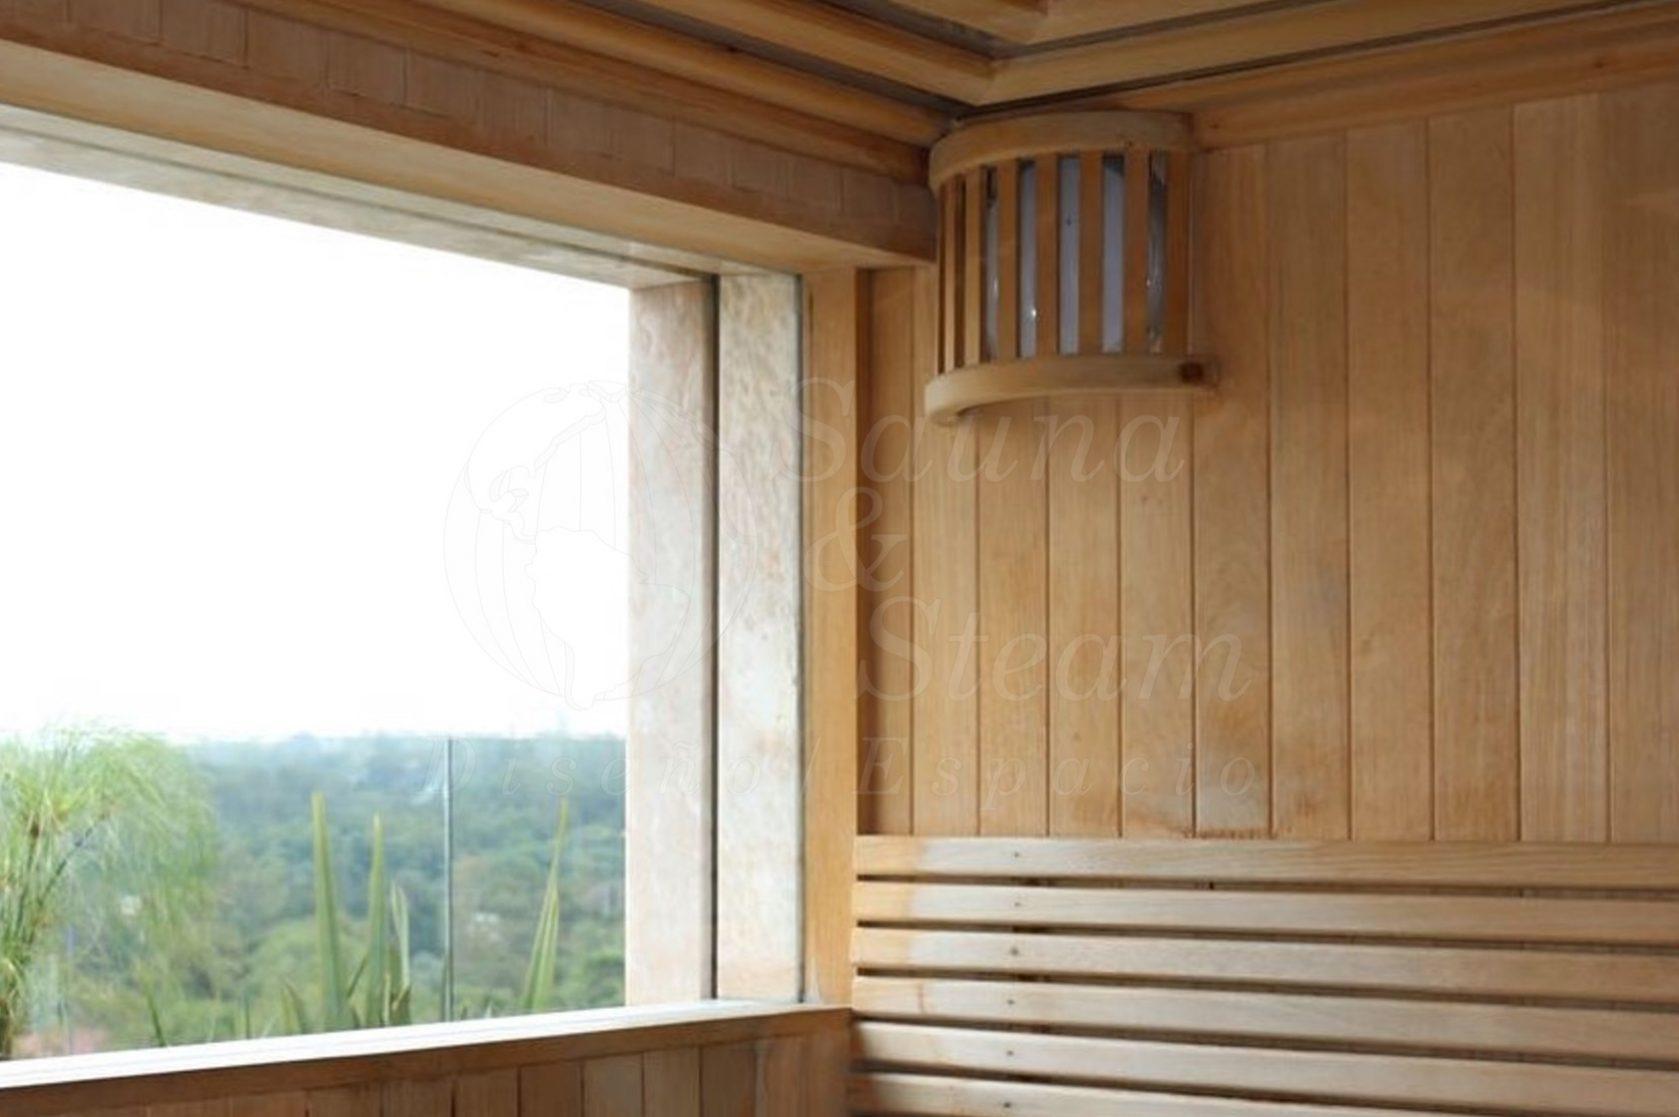 sauna-steam-saunas-exteriores_009